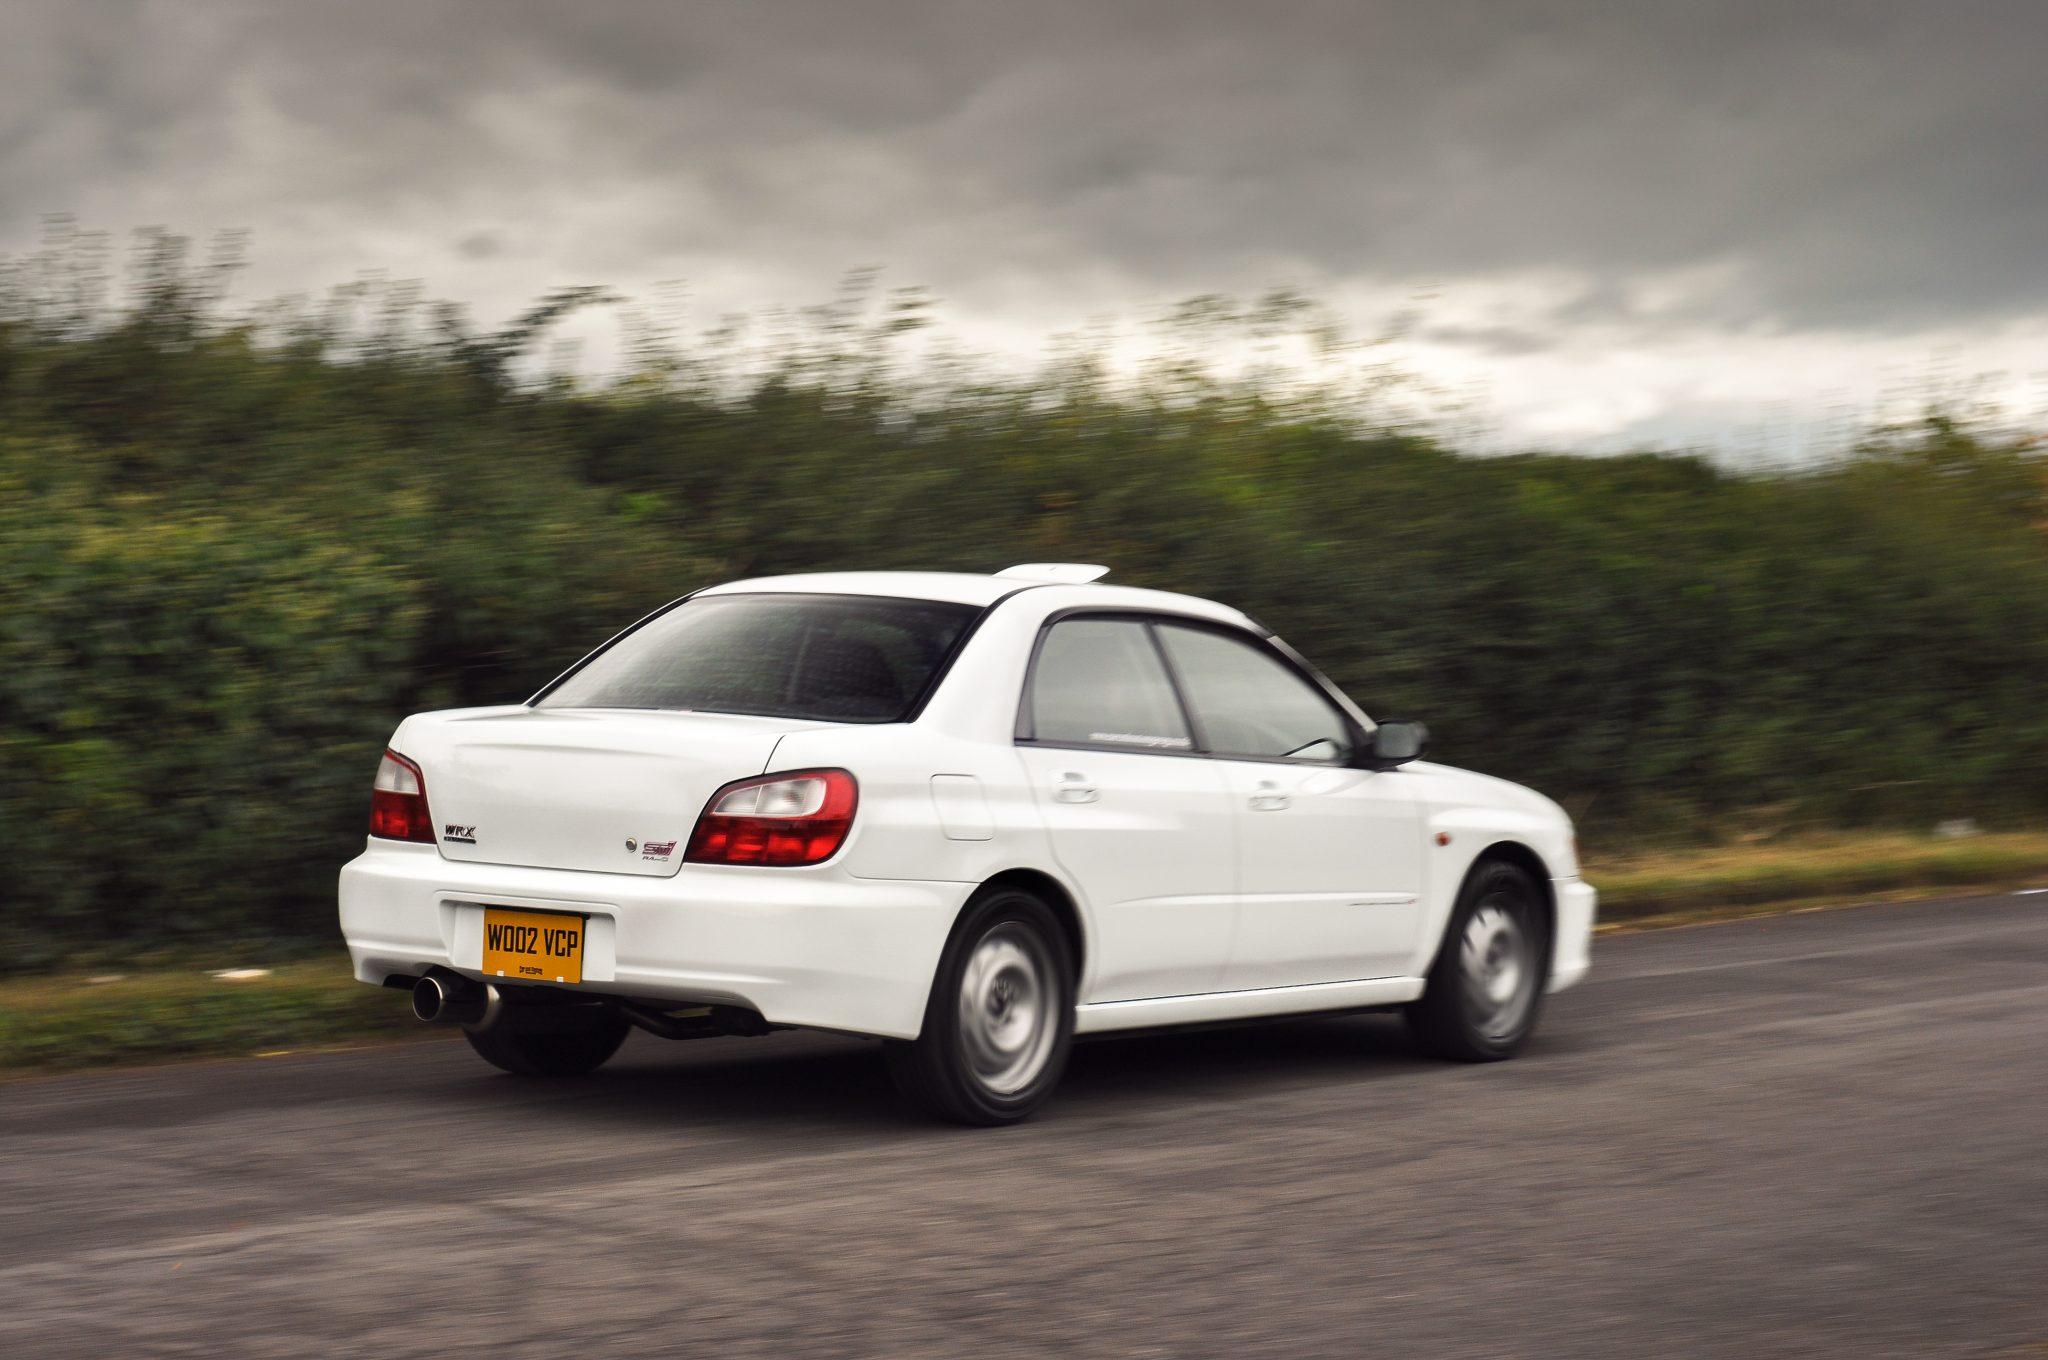 Image of Car and Custom Garage 2002 Subaru Impreza Wrx Sti Type RA Spec C 16 inch